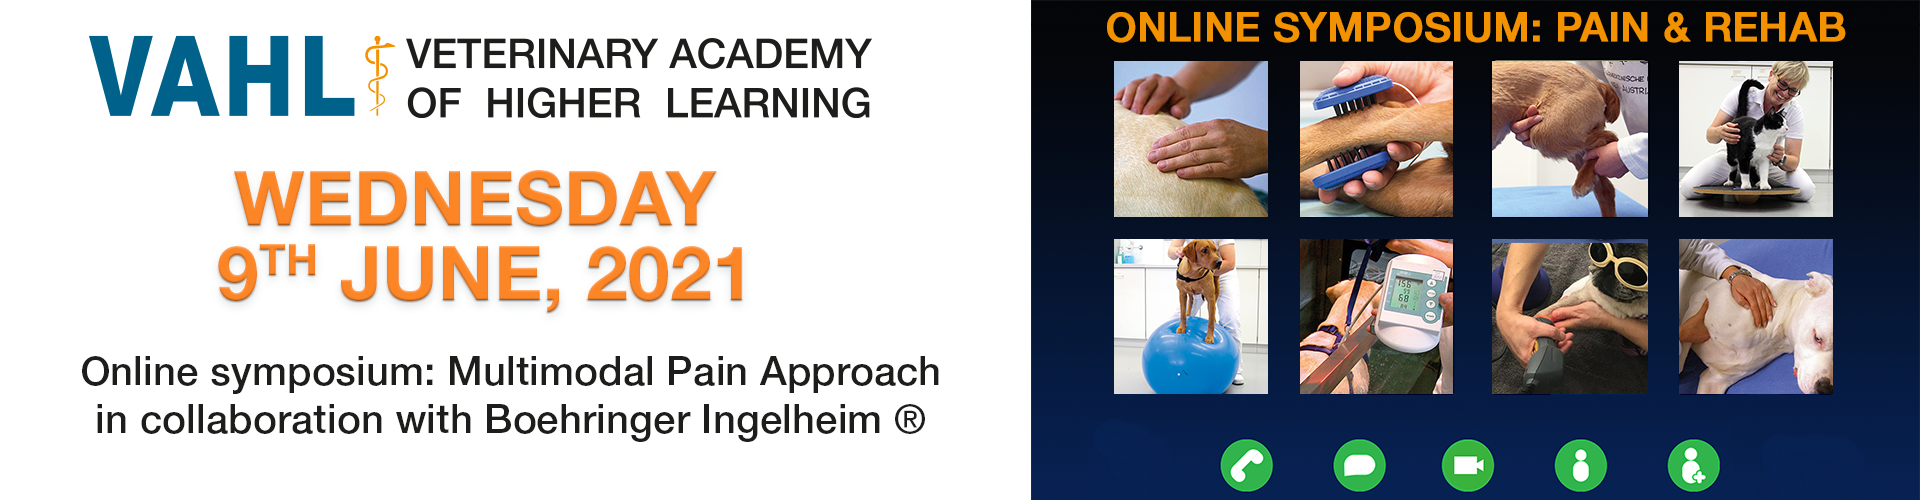 VAHL Online Symposium Pain & Rehab